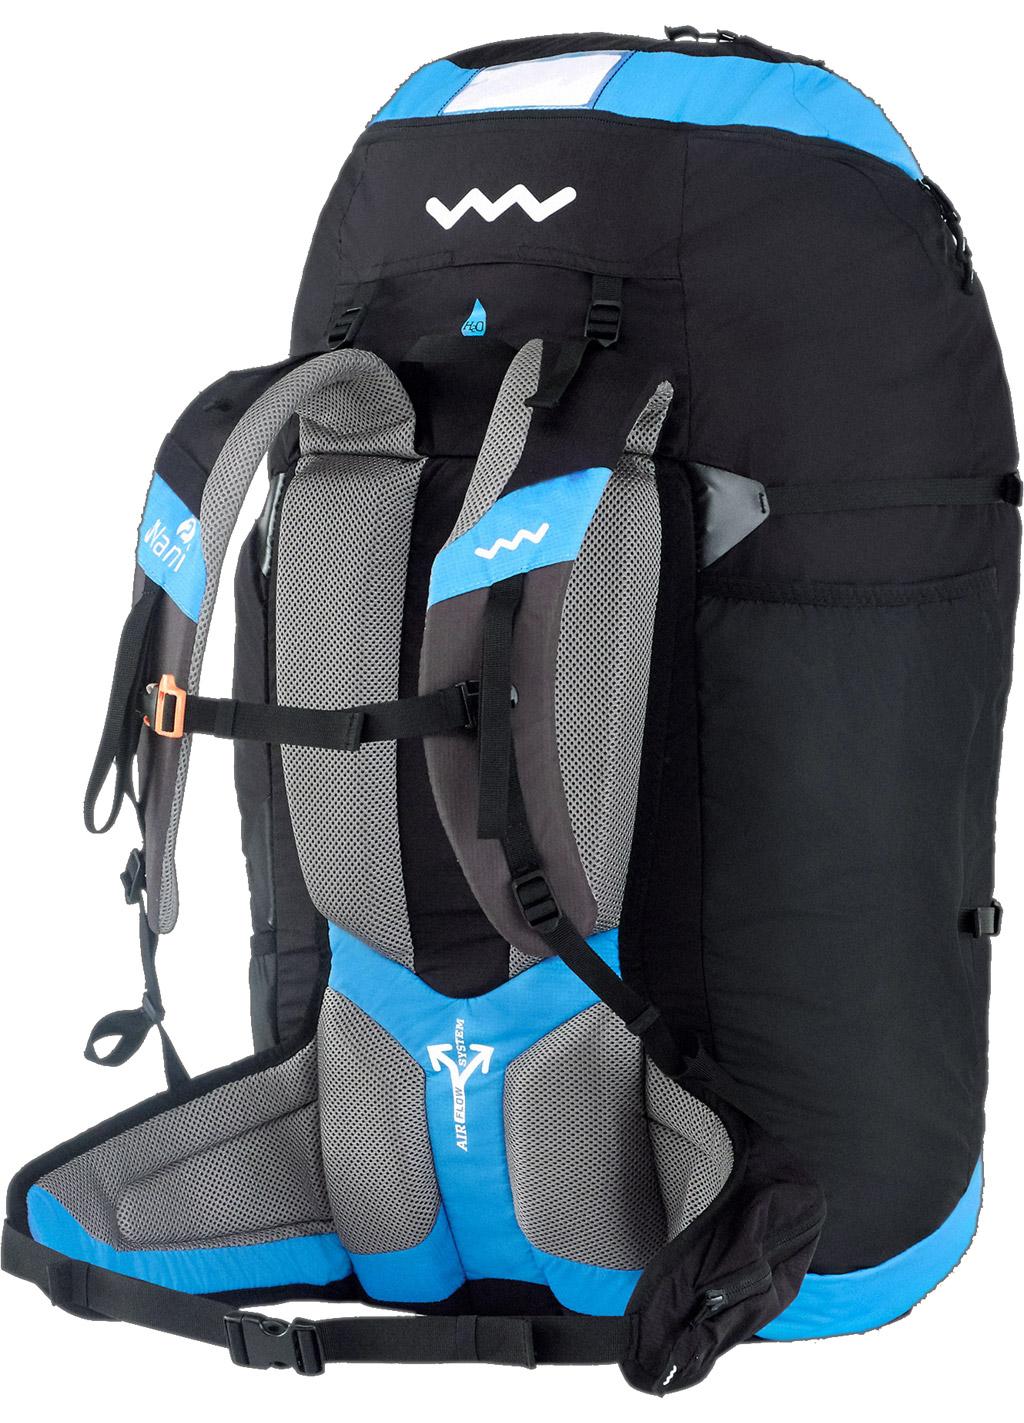 Woody Valley Wani 2 rucksack back